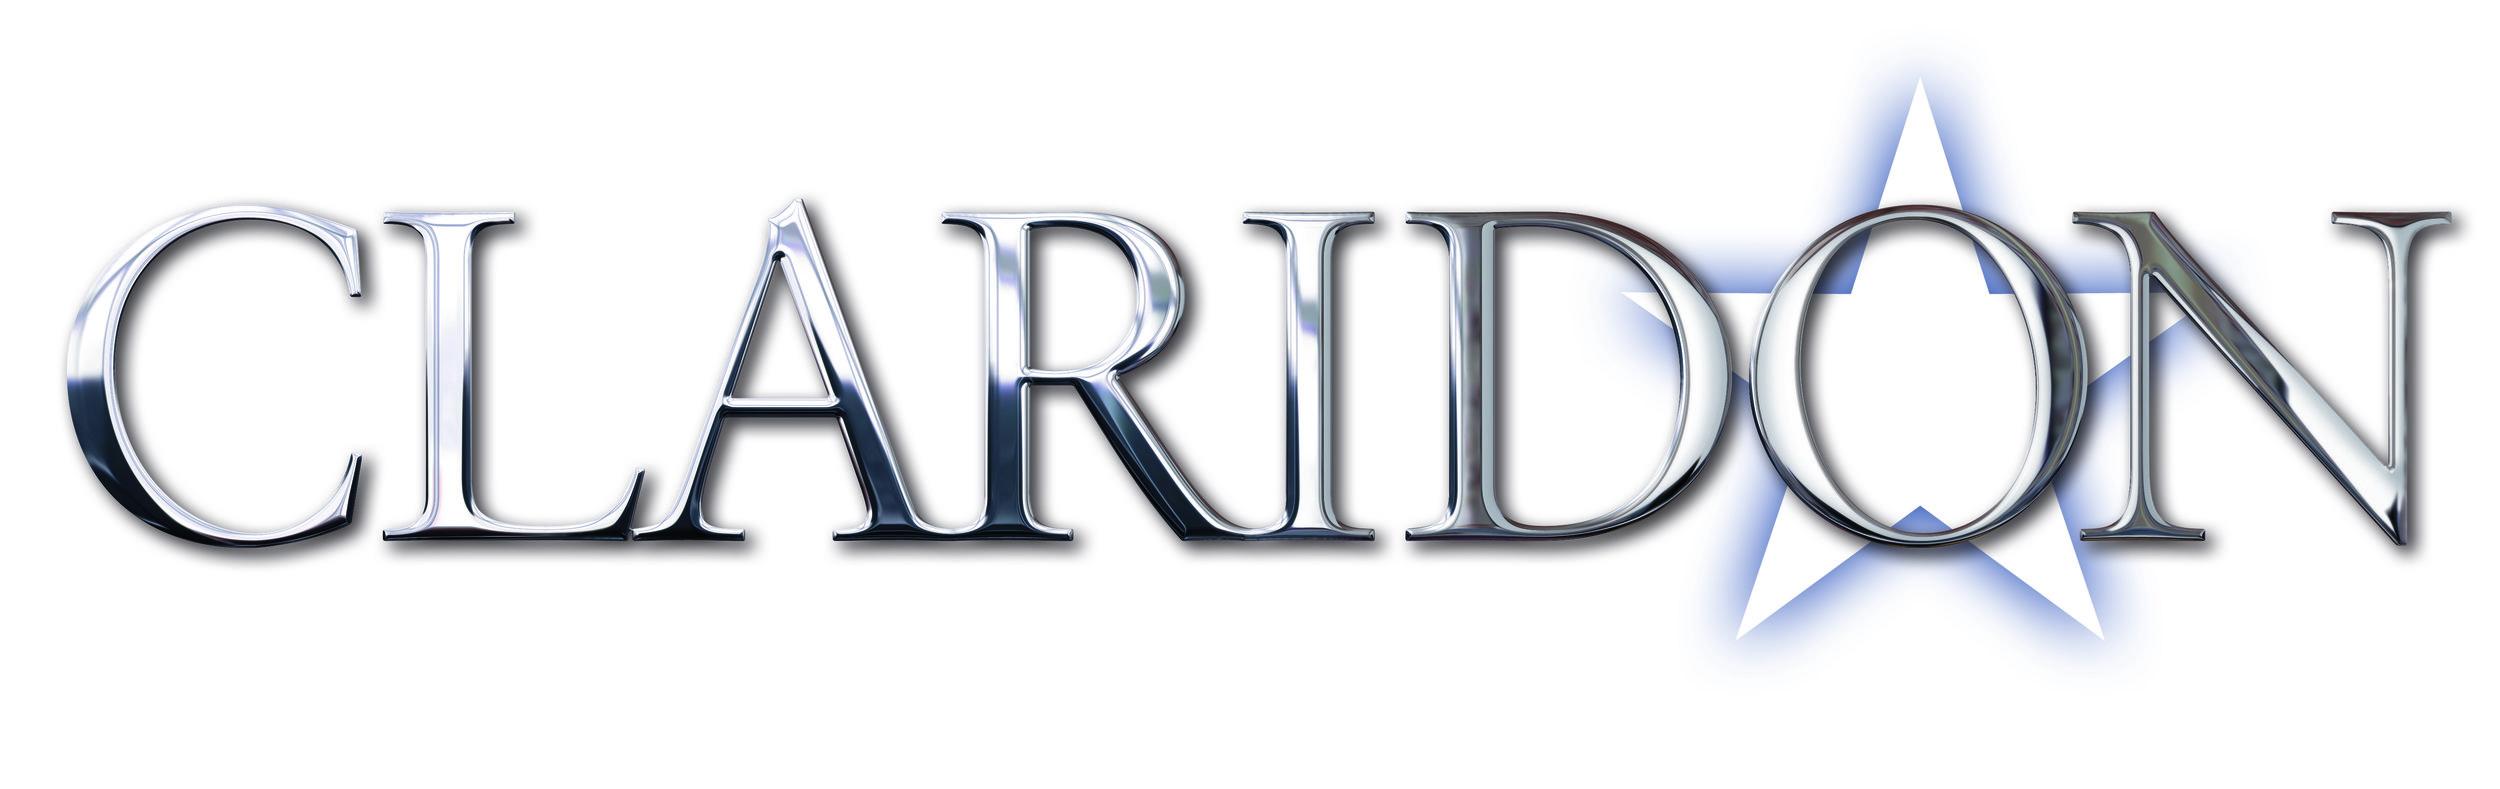 Claridon.jpg